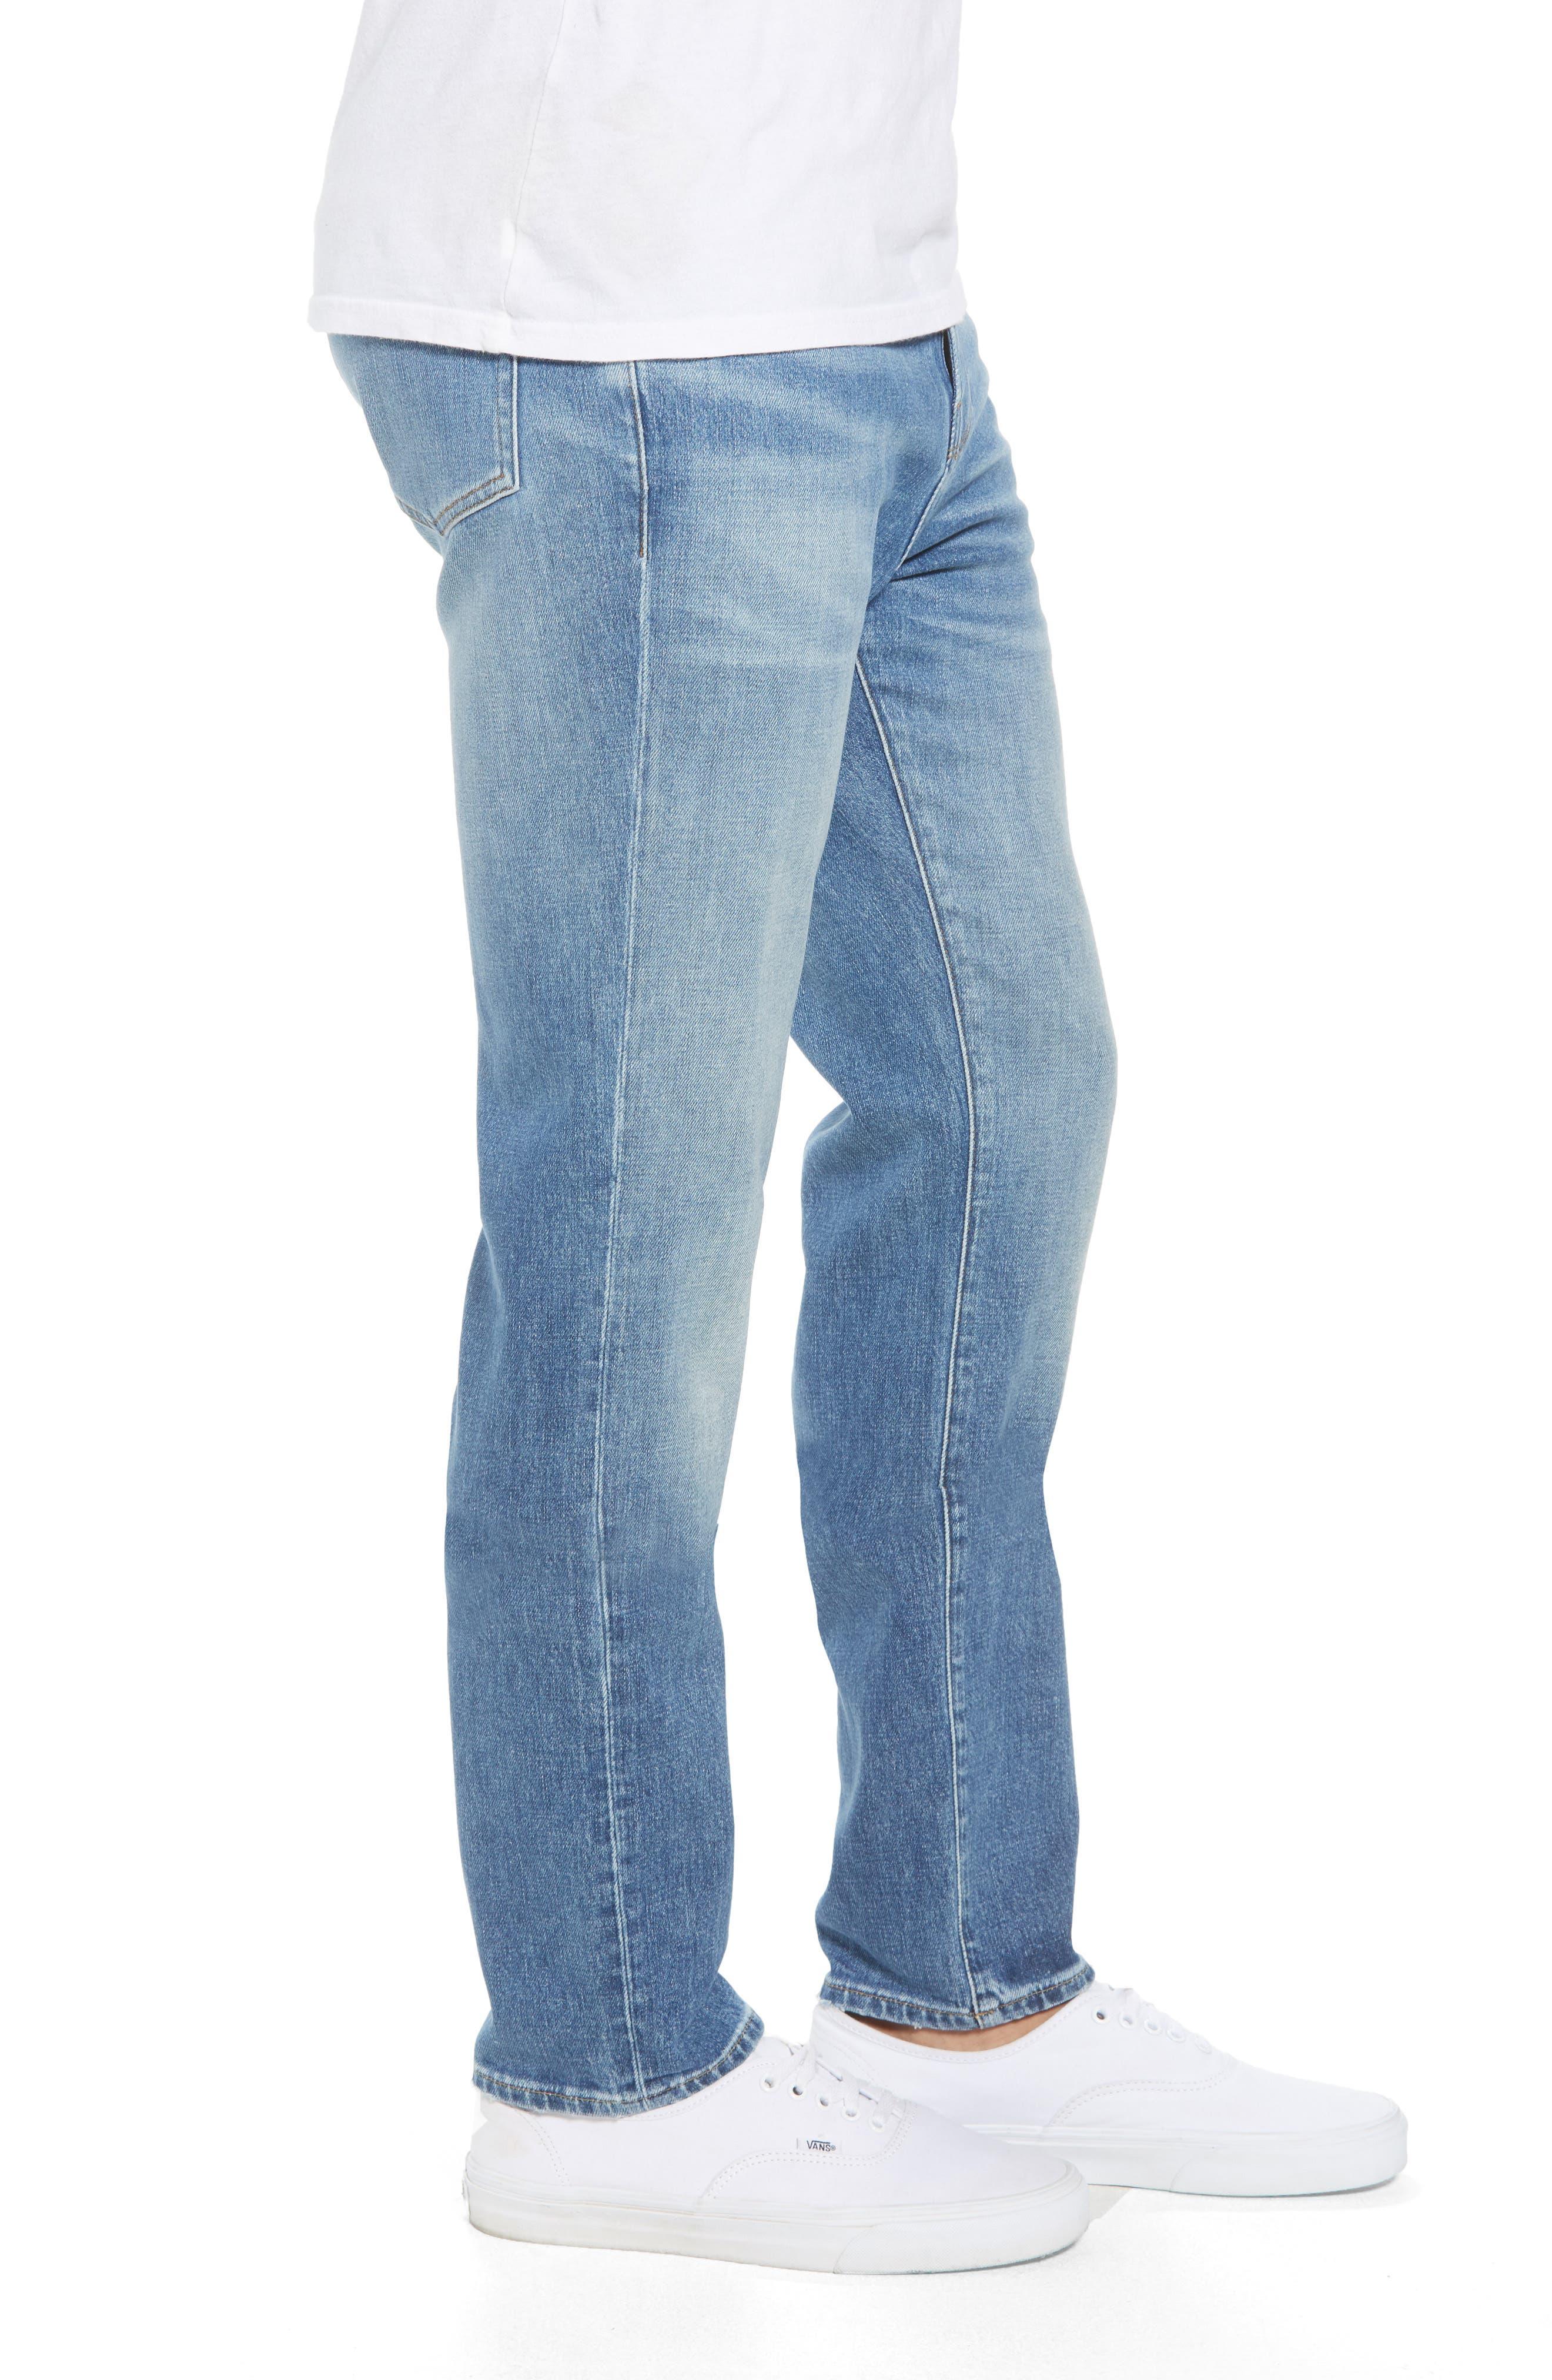 L'Homme Skinny Jeans,                             Alternate thumbnail 3, color,                             PICKNEY